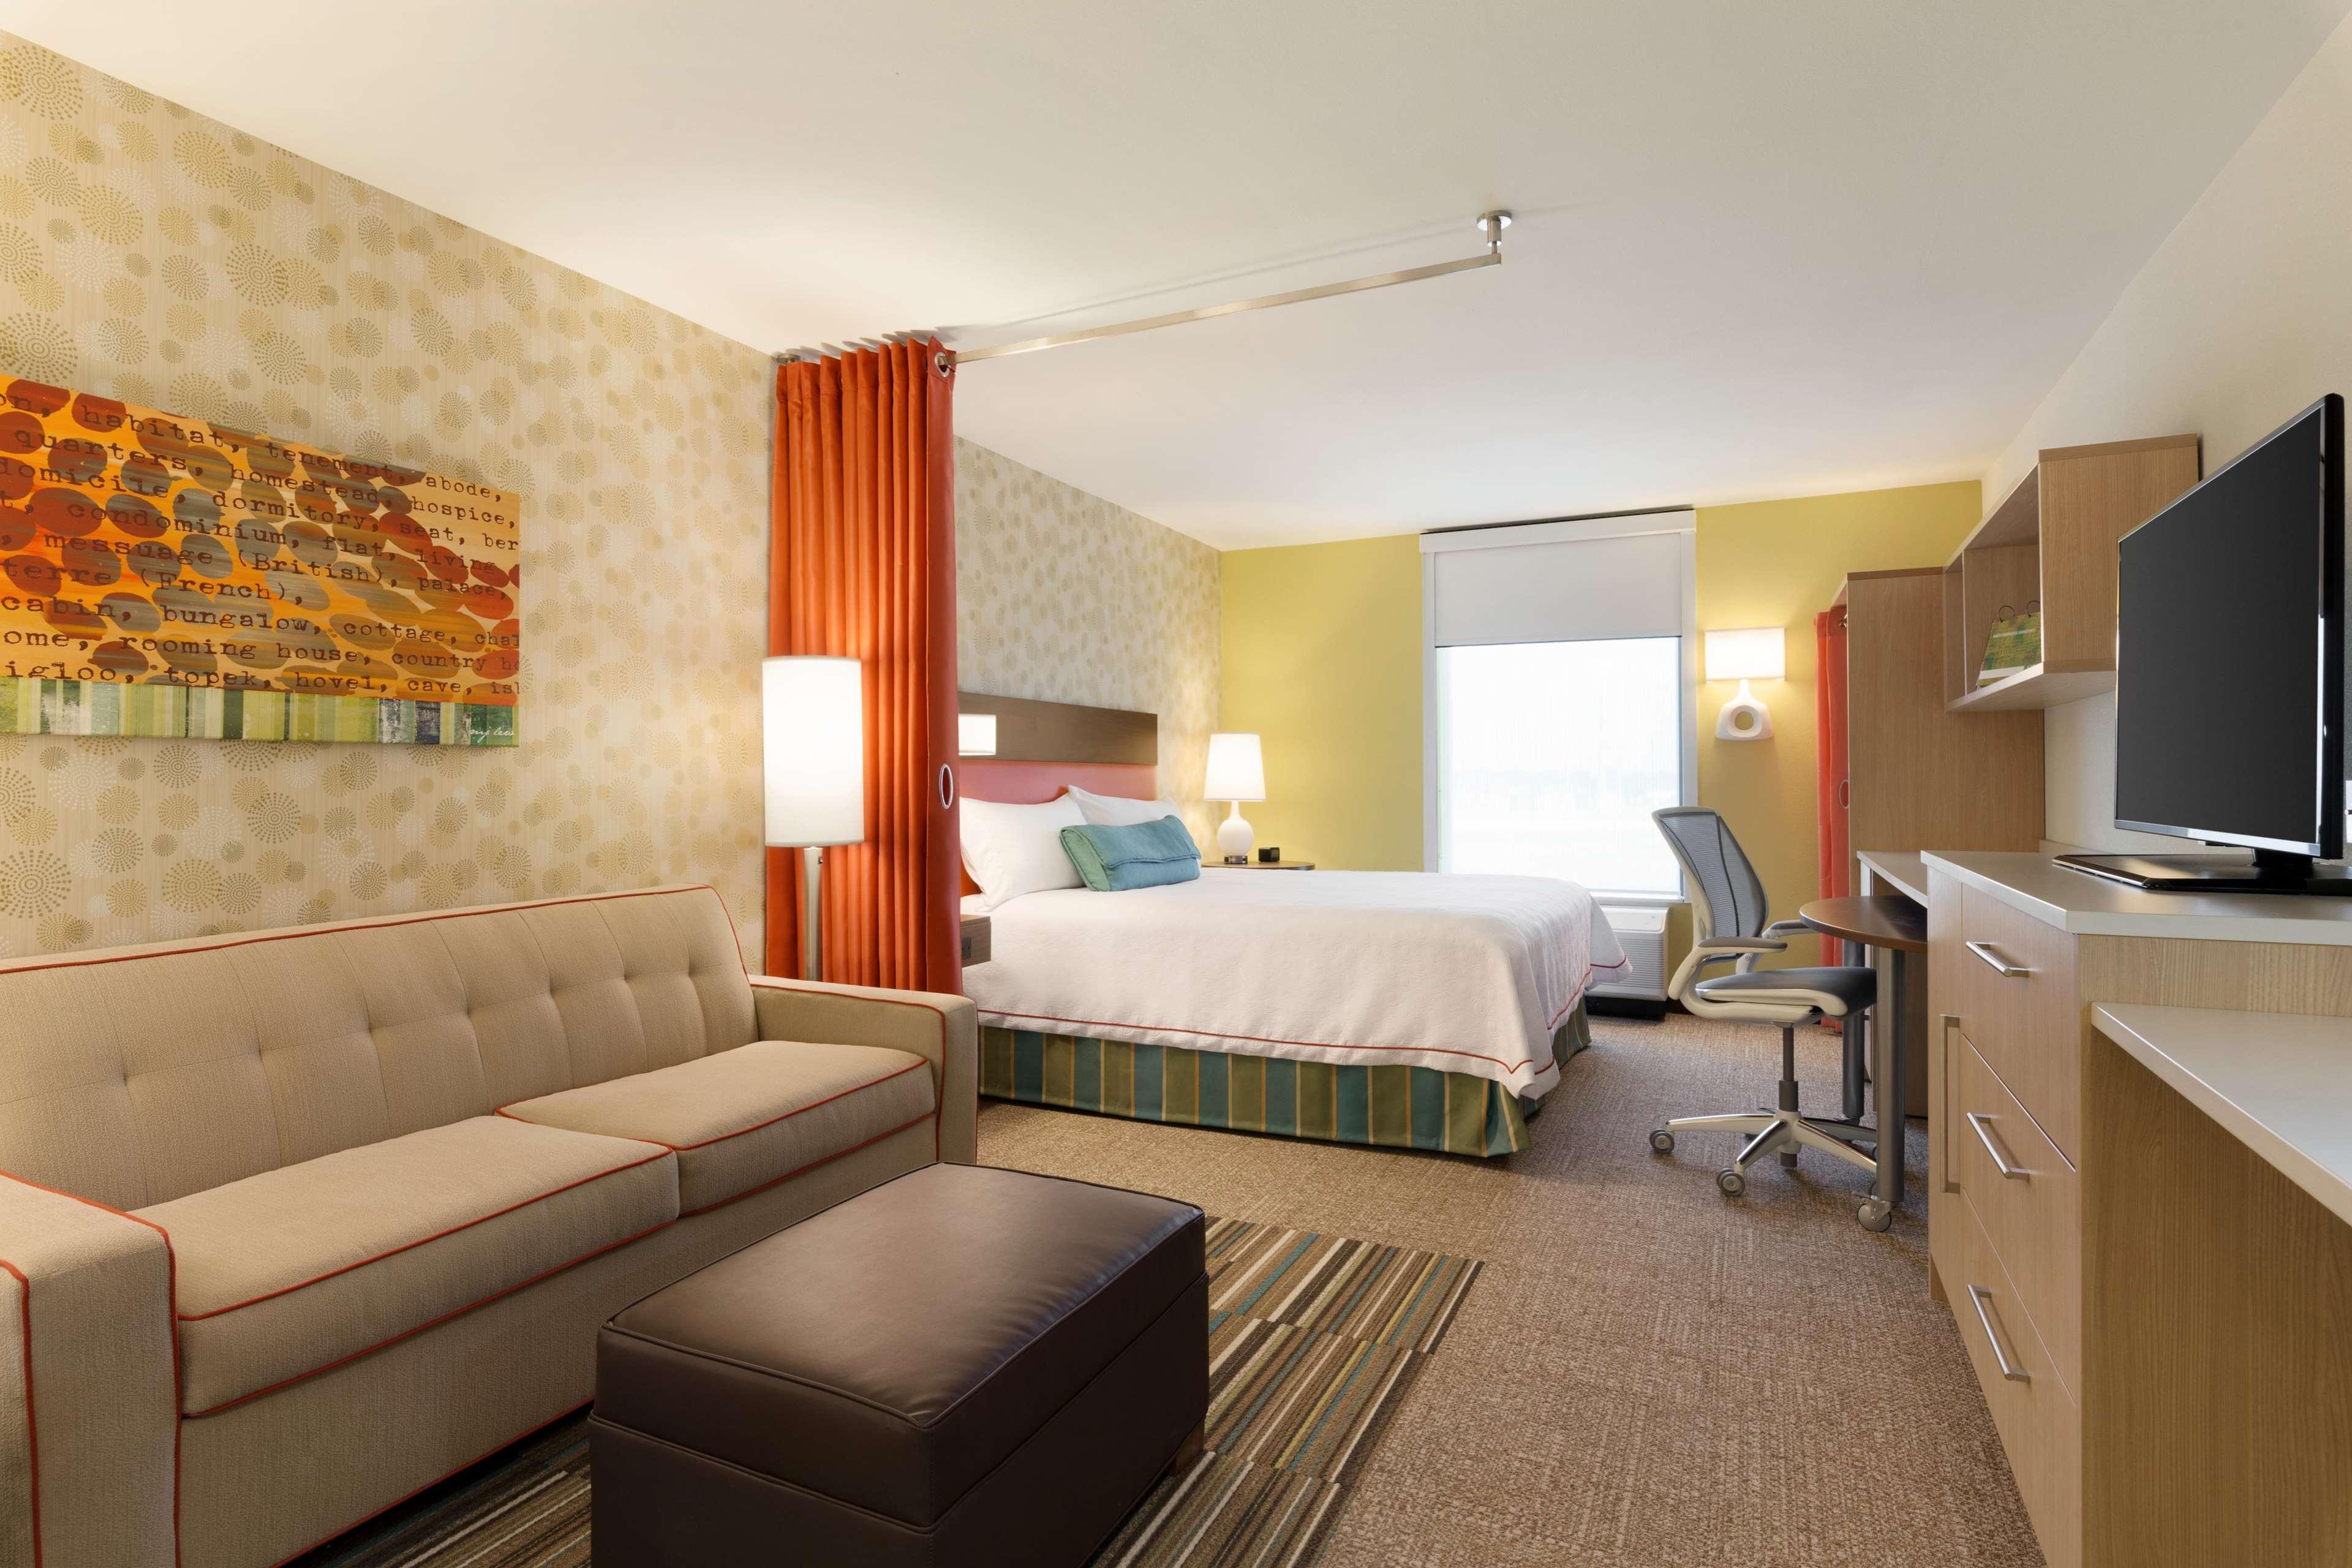 Home2 Suites by Hilton Waco image 4